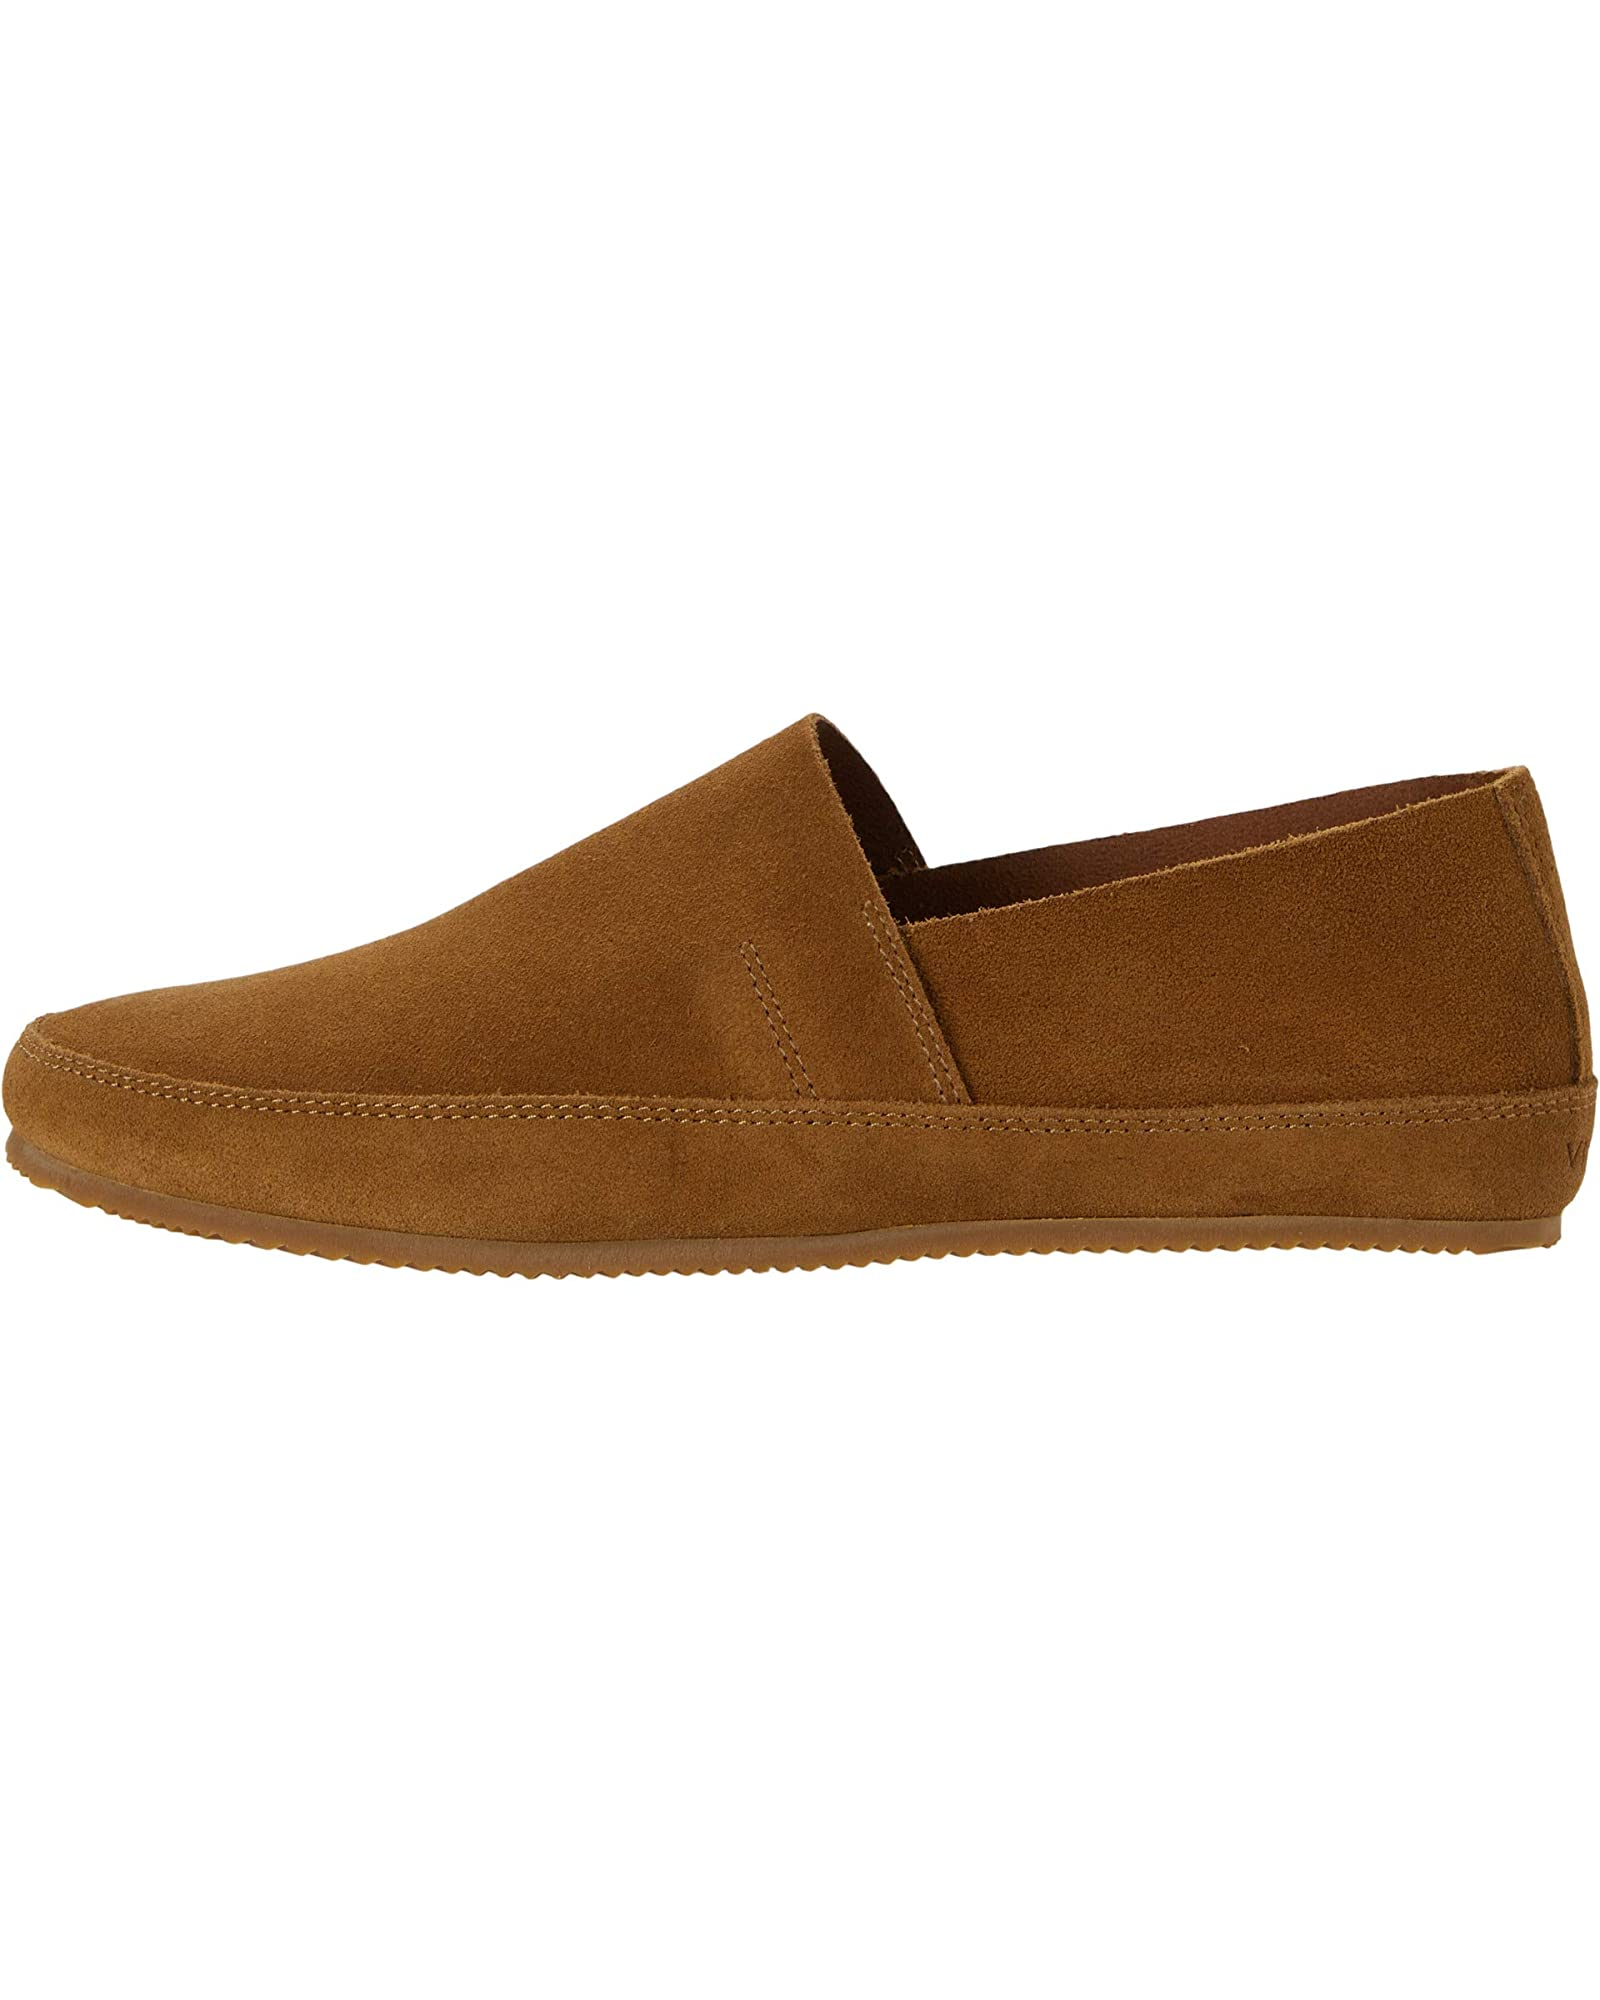 Vince loafers, best loafers for men